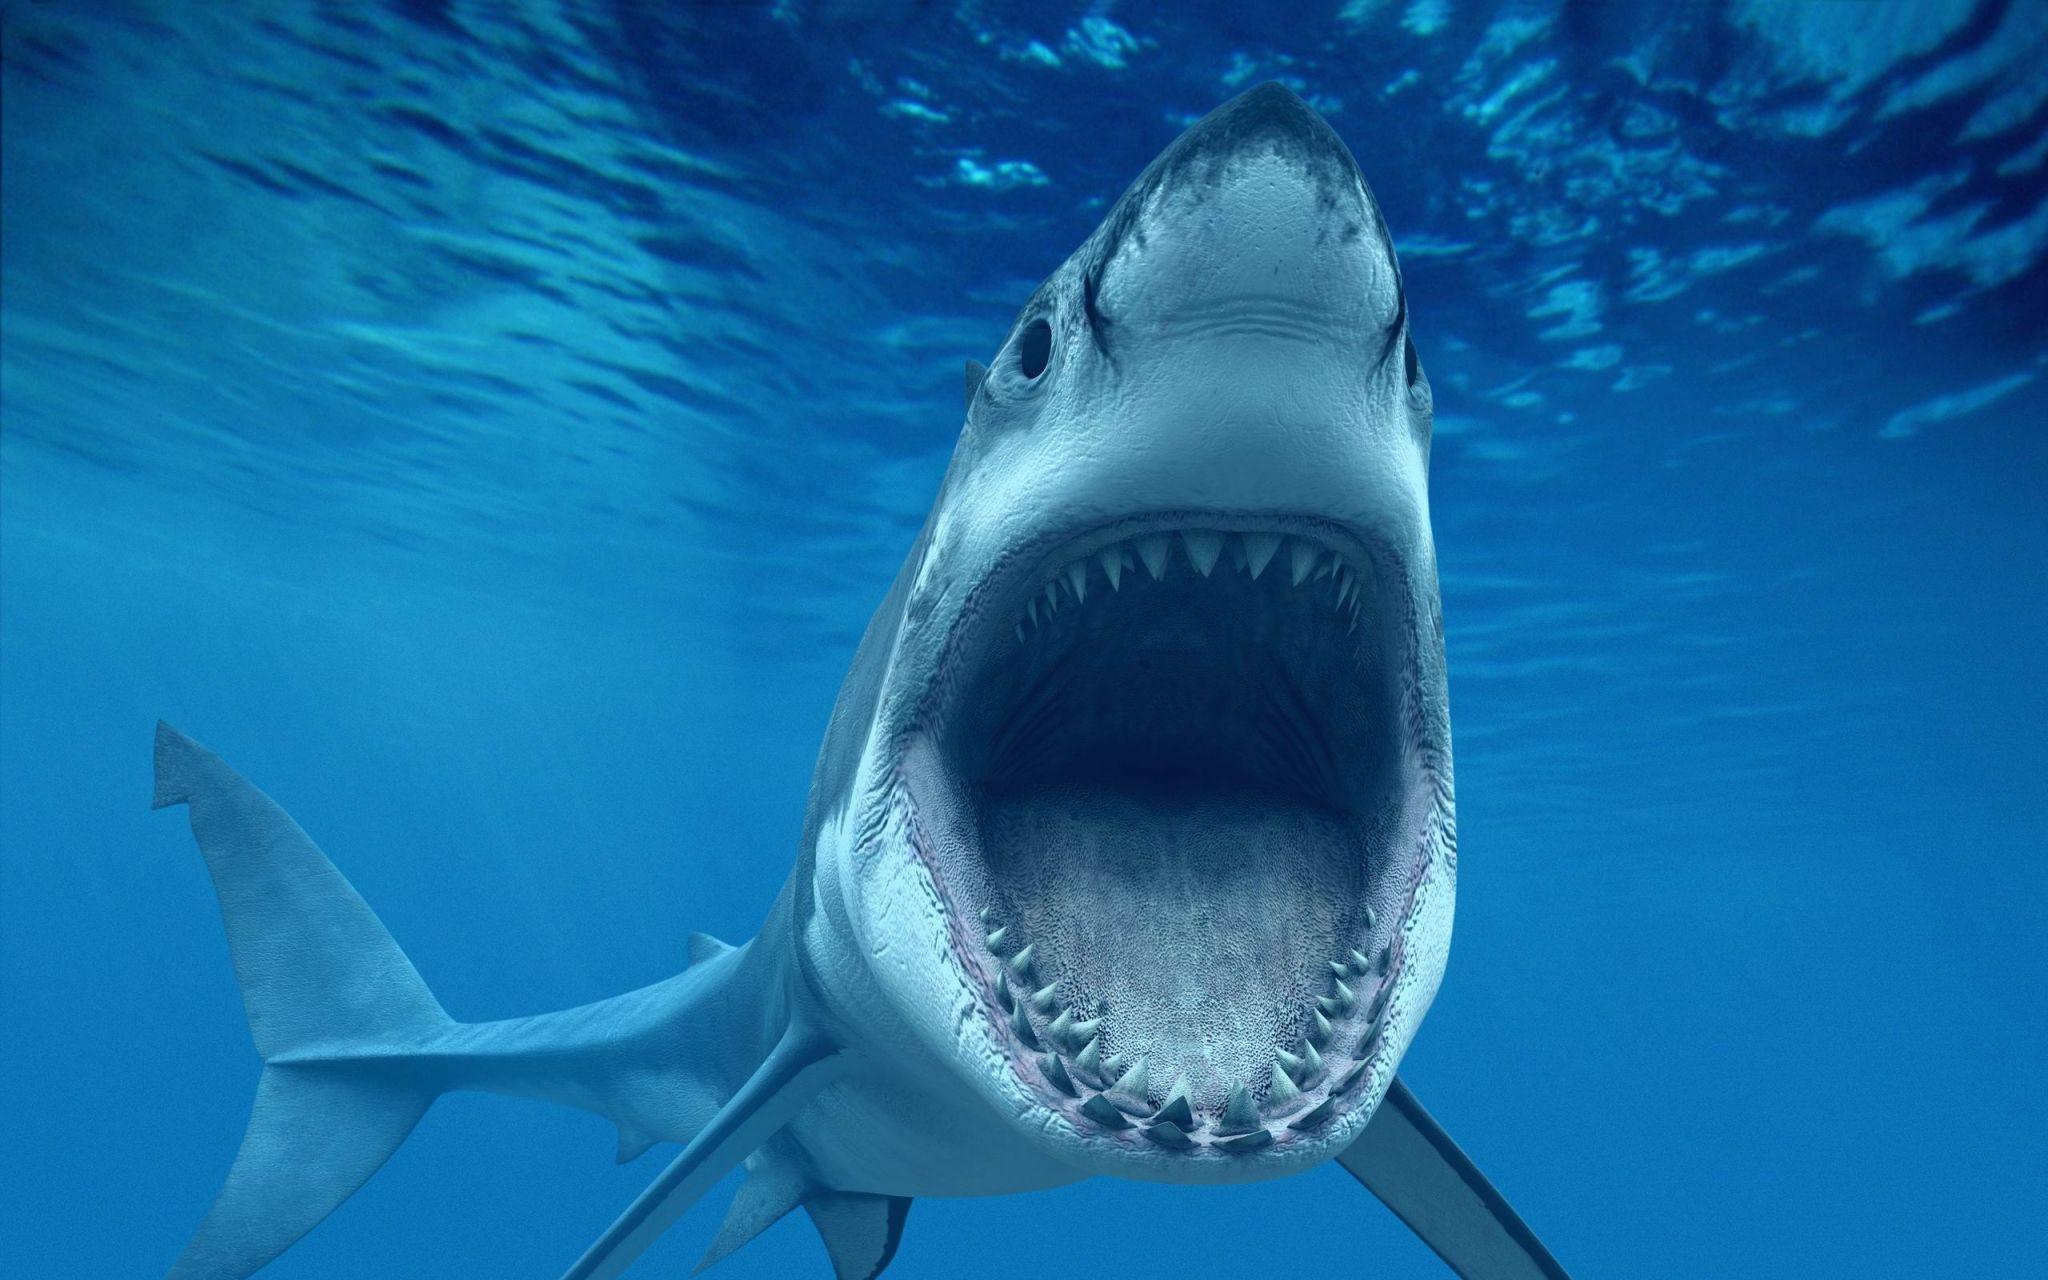 Shark Hd Wallpapers 1080p High Quality Shark Pictures Shark White Sharks